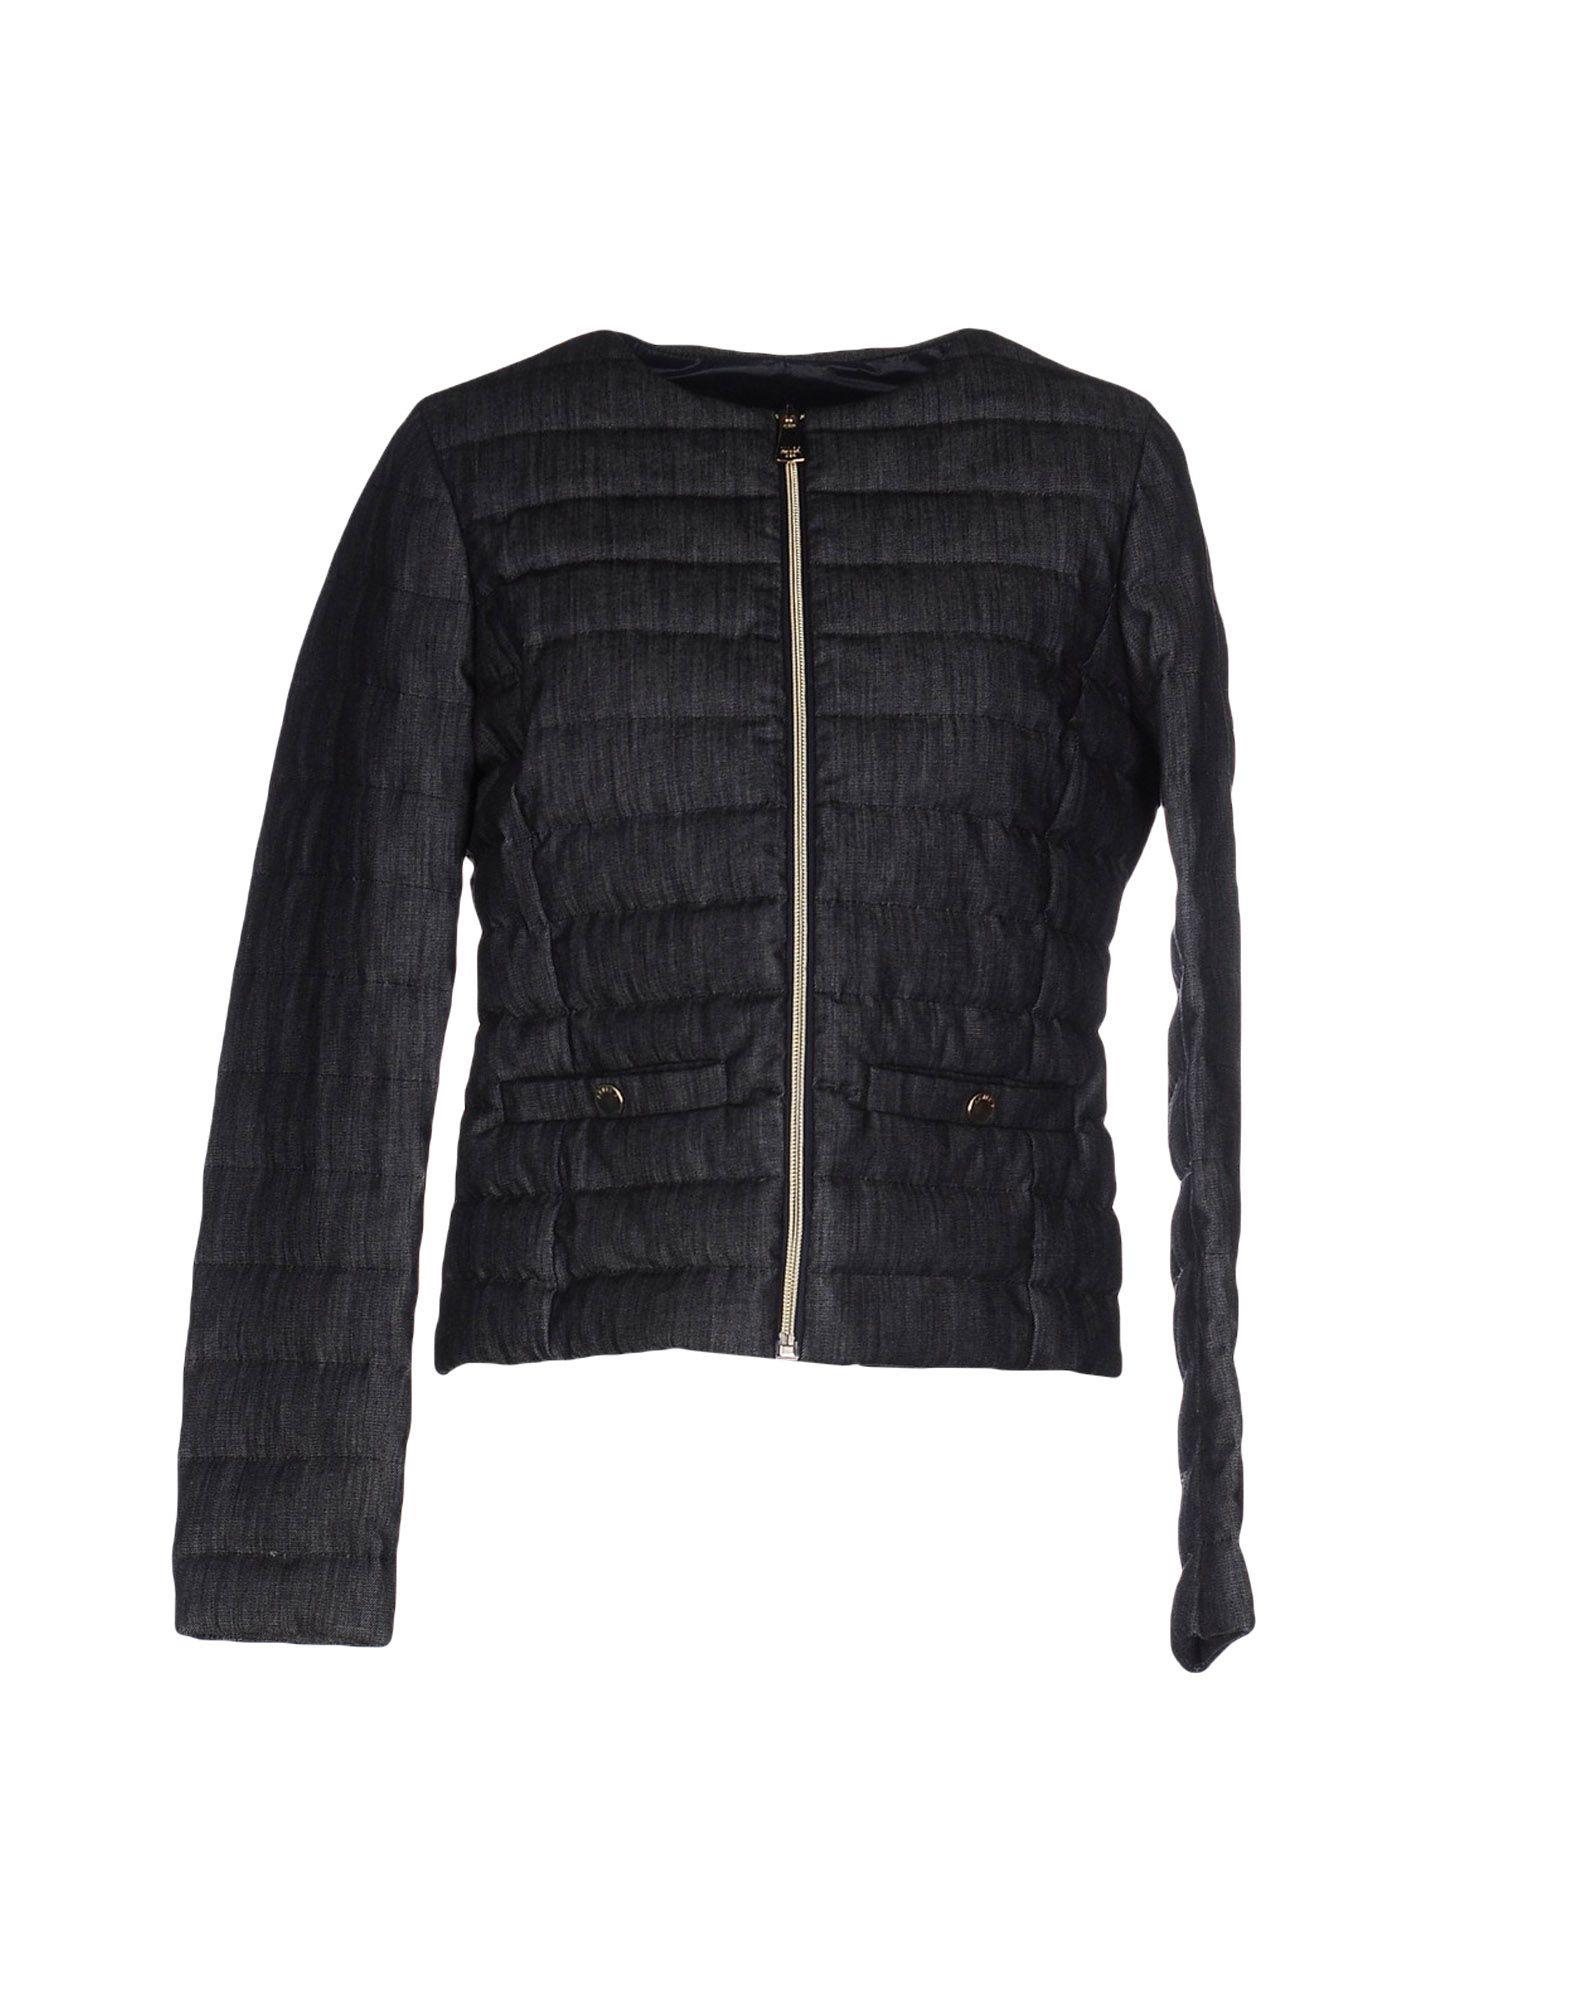 ANNIE P. Down jackets